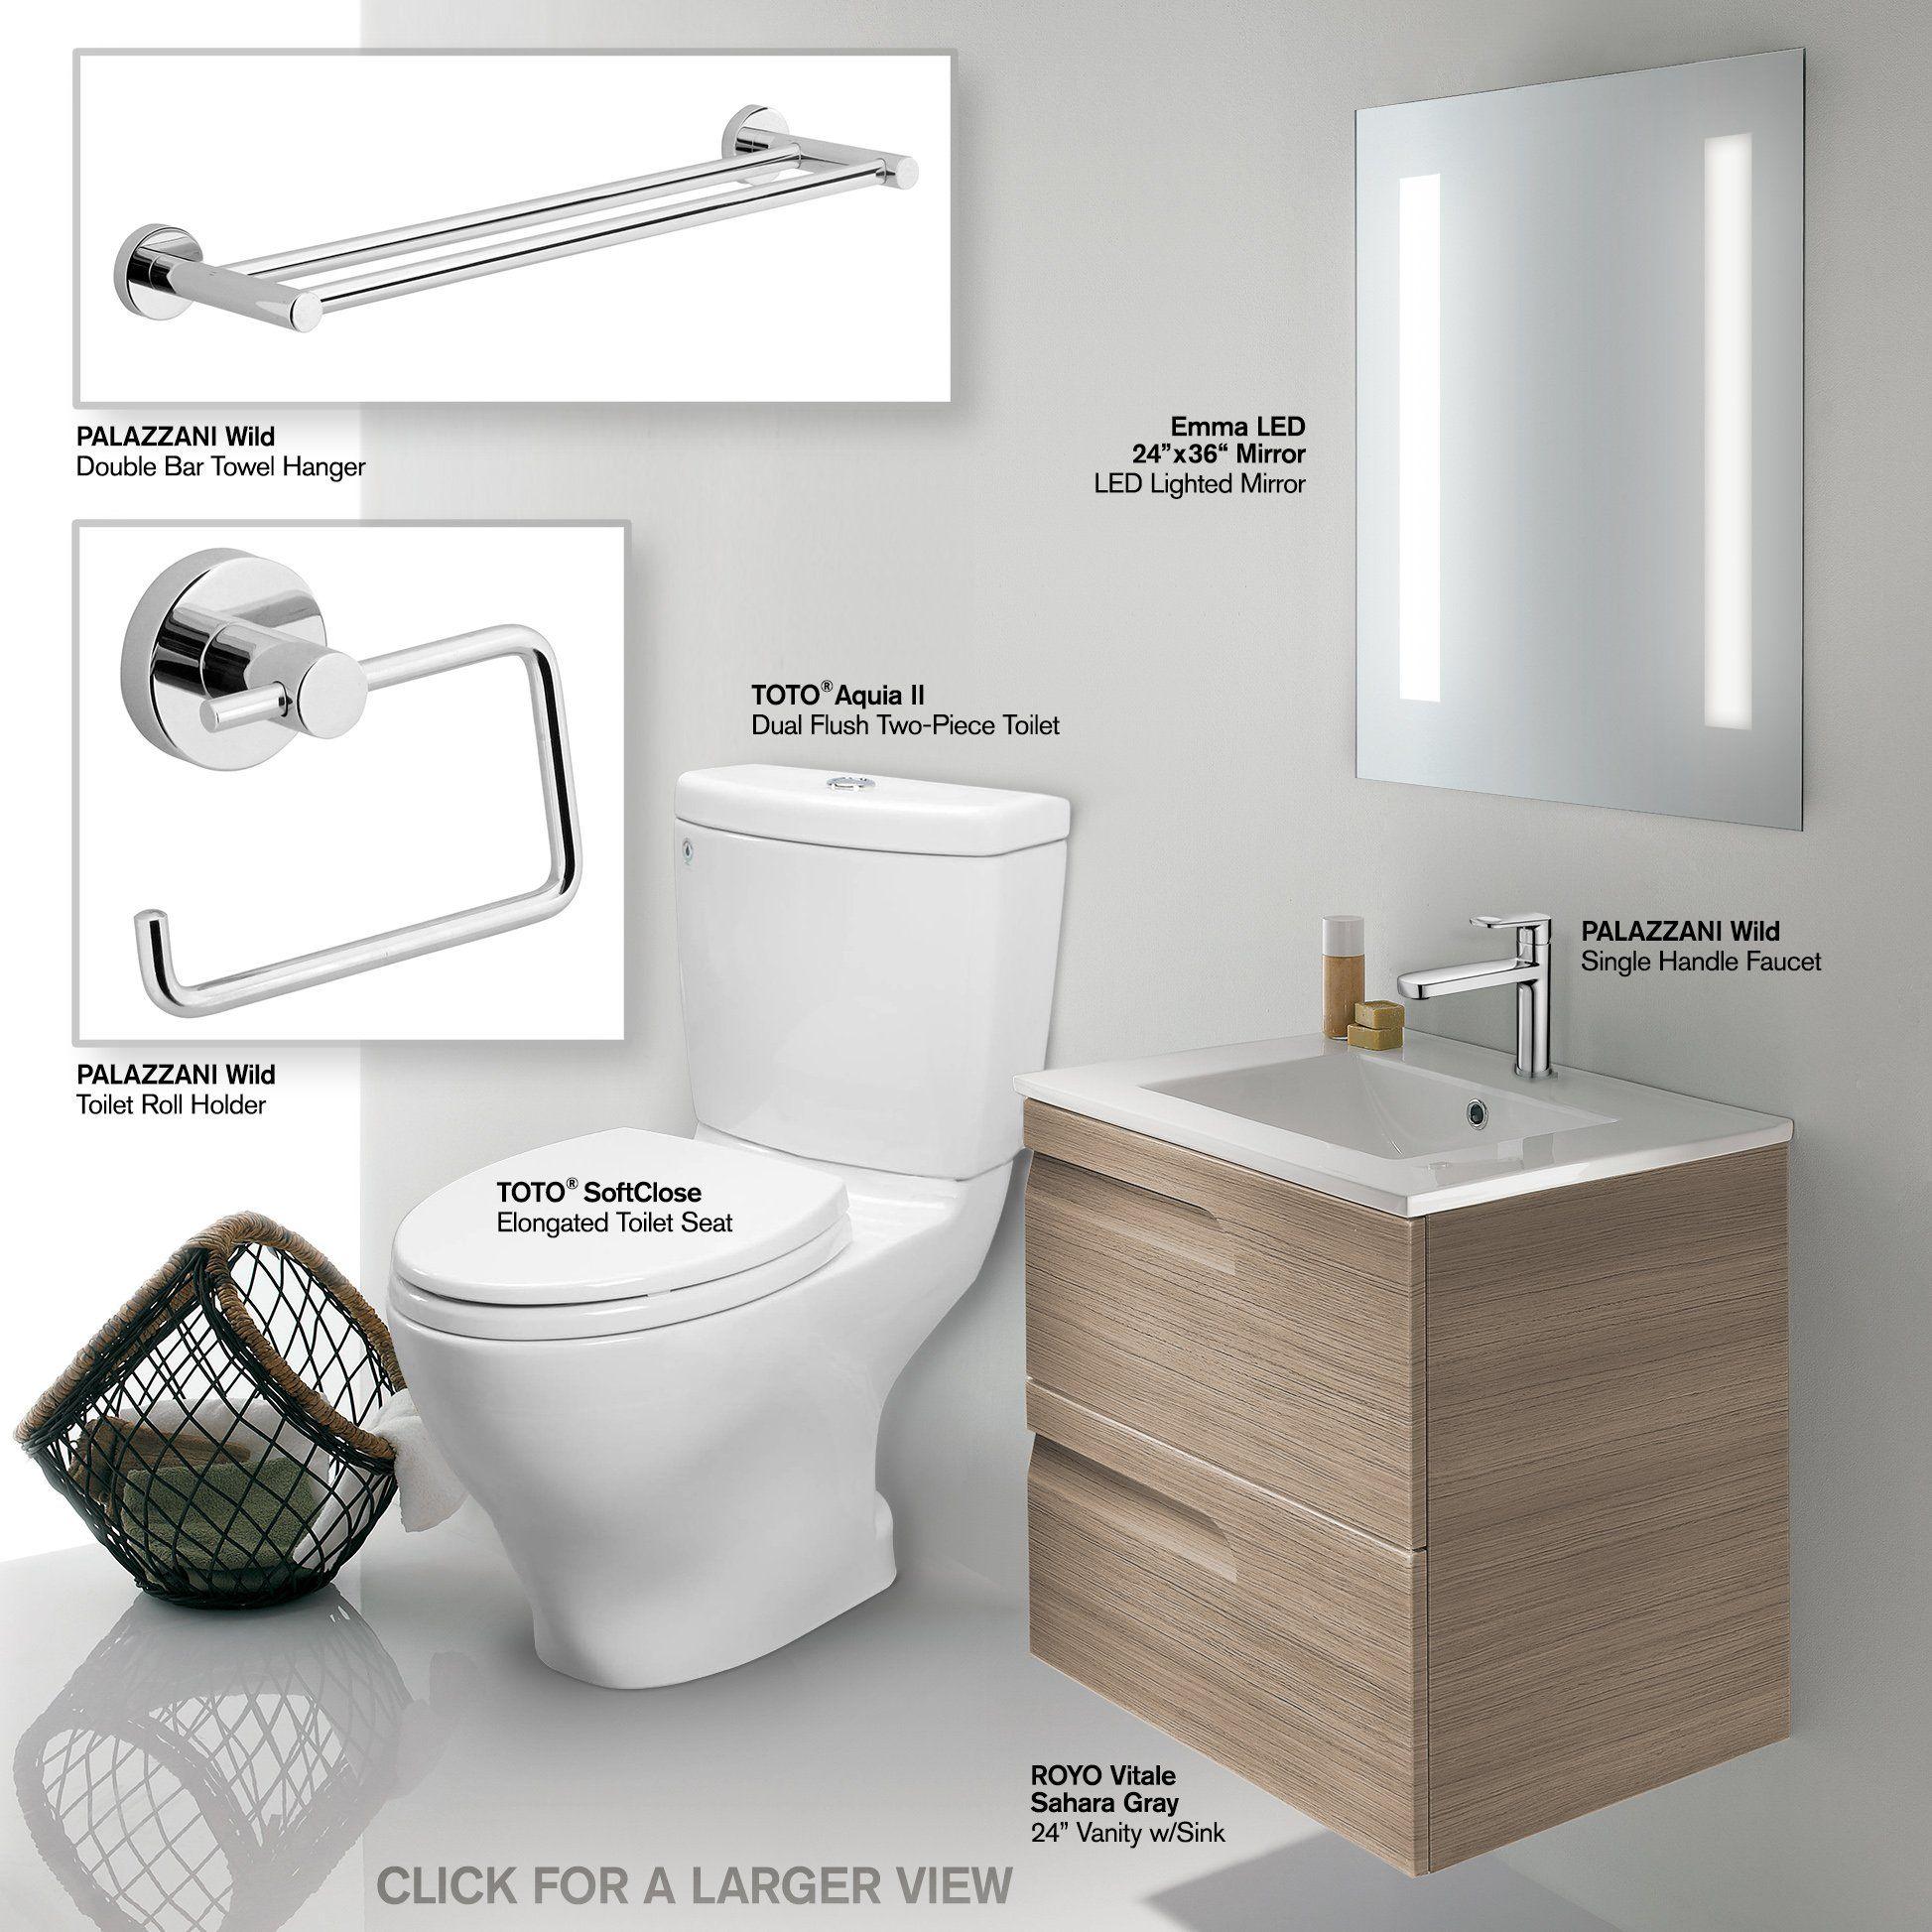 Bathroom vanity set includes toto cstm toilet